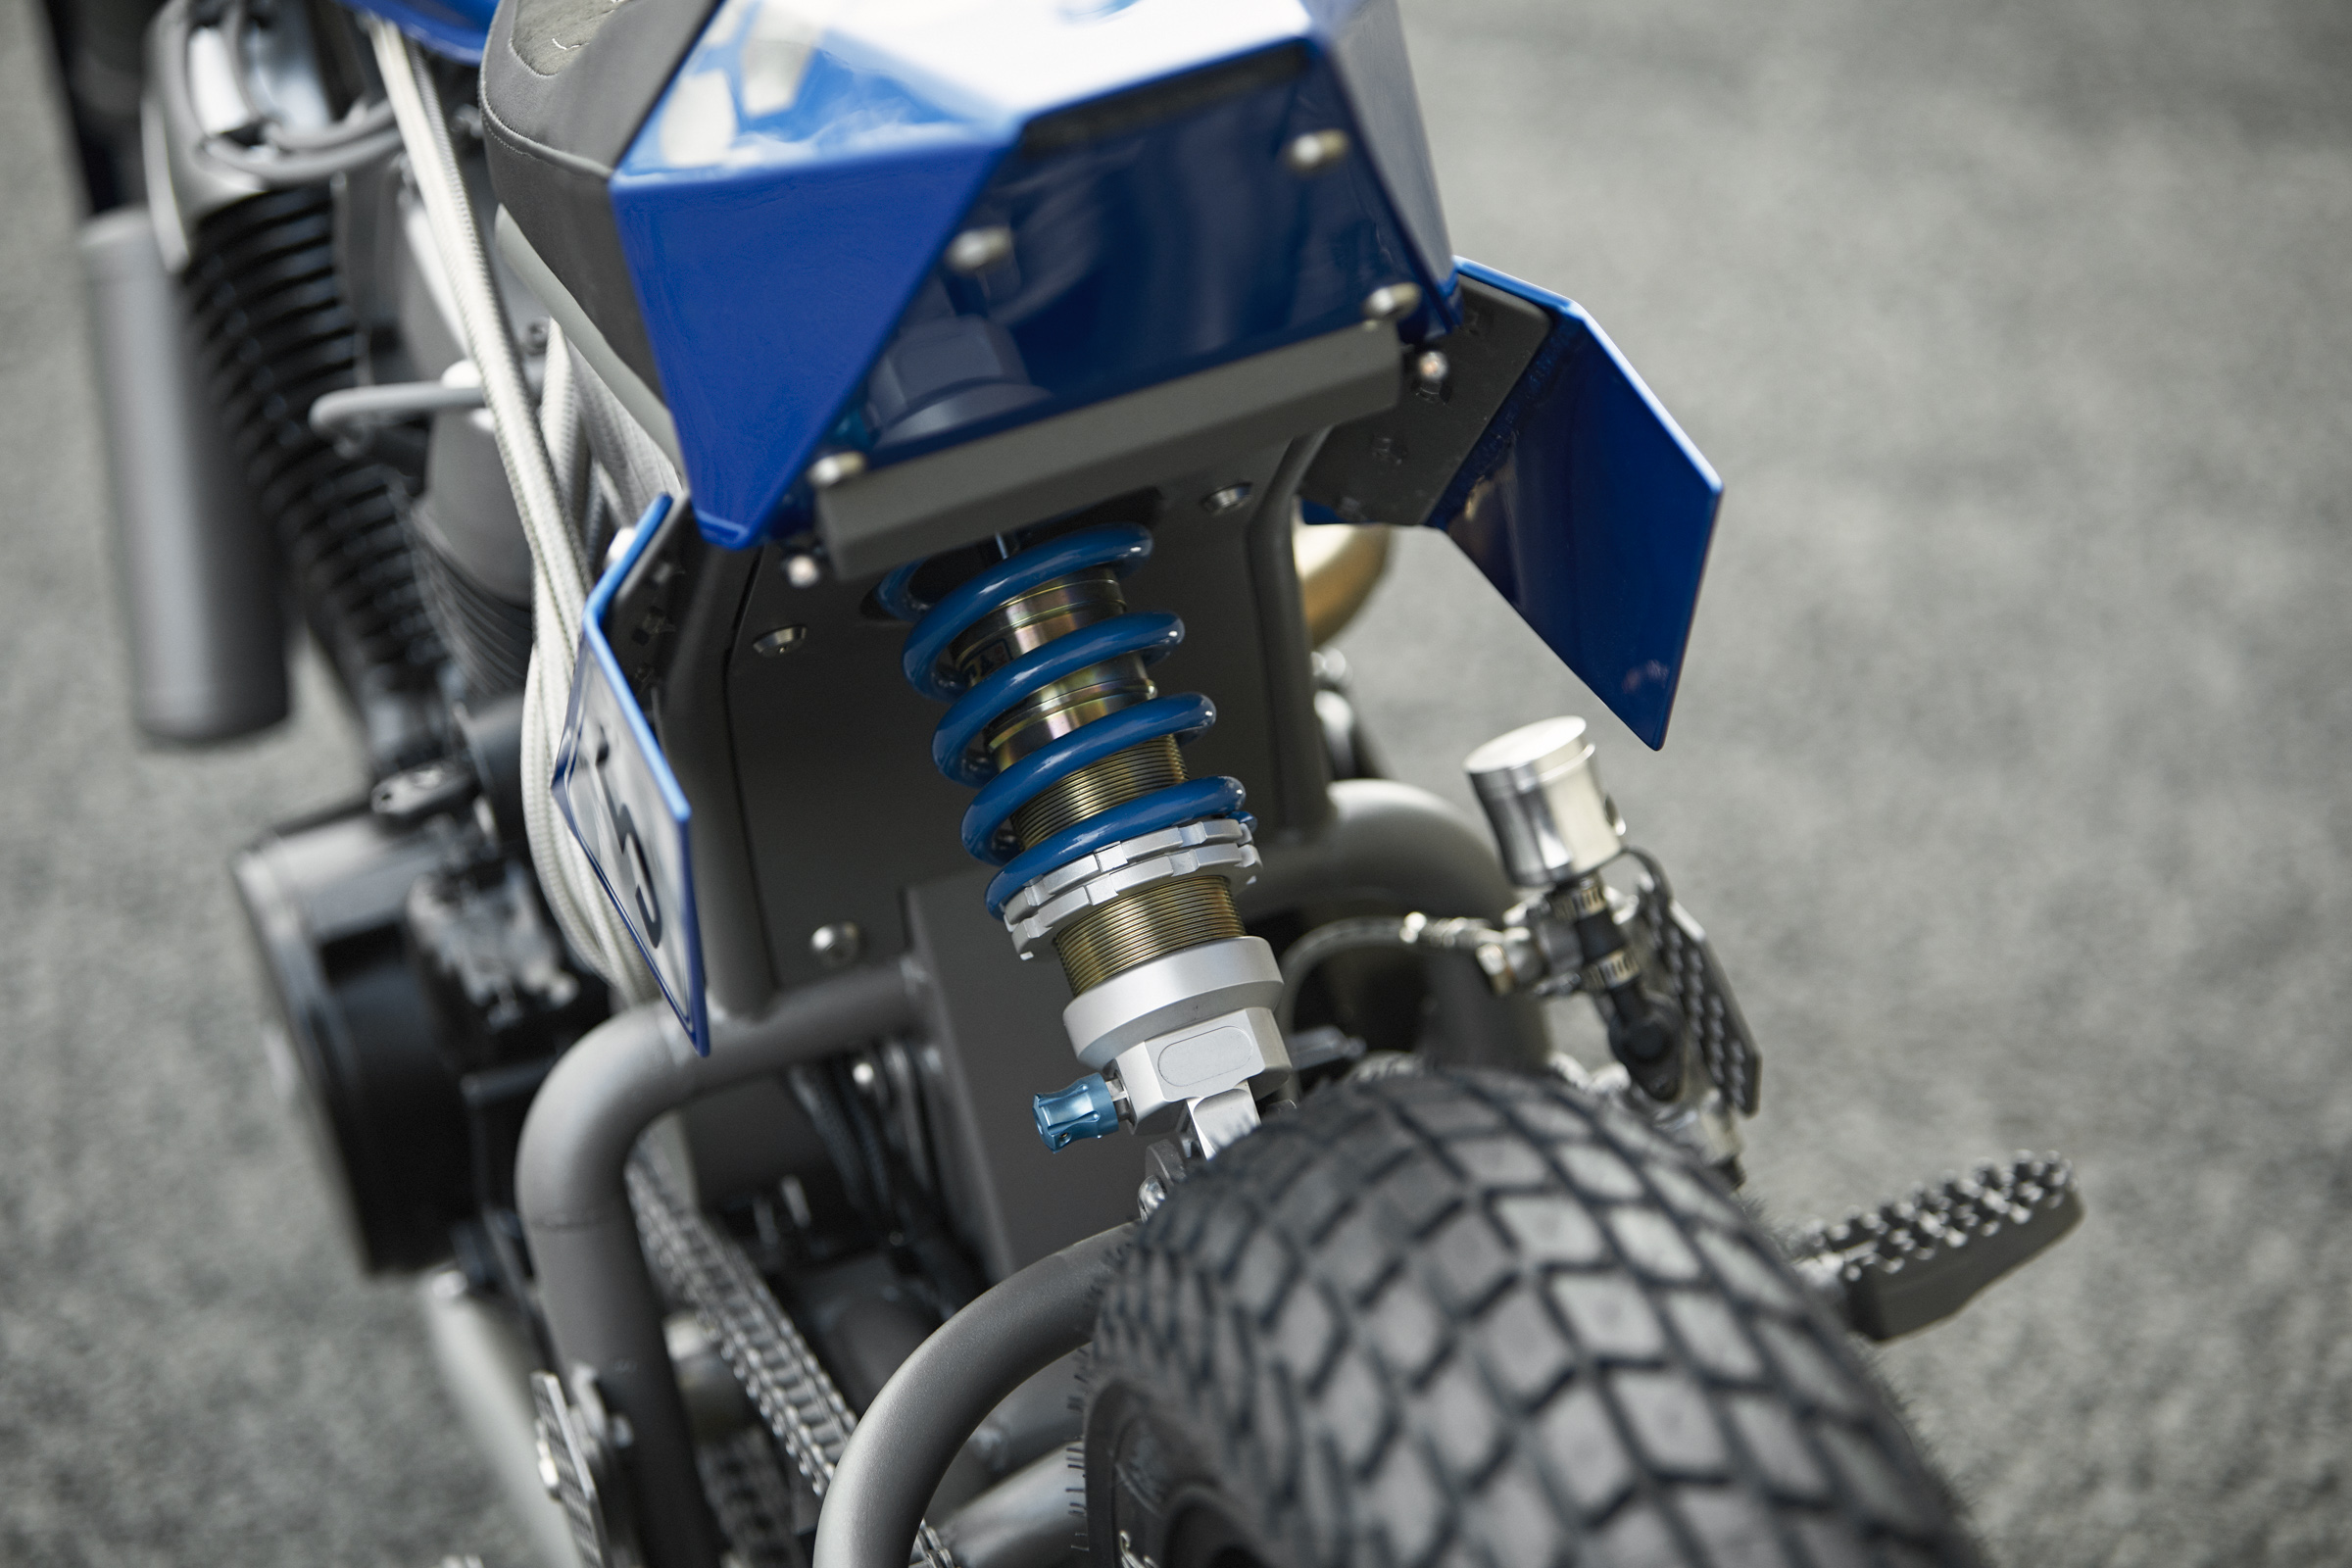 Honda Shadow 750 custom steel bike